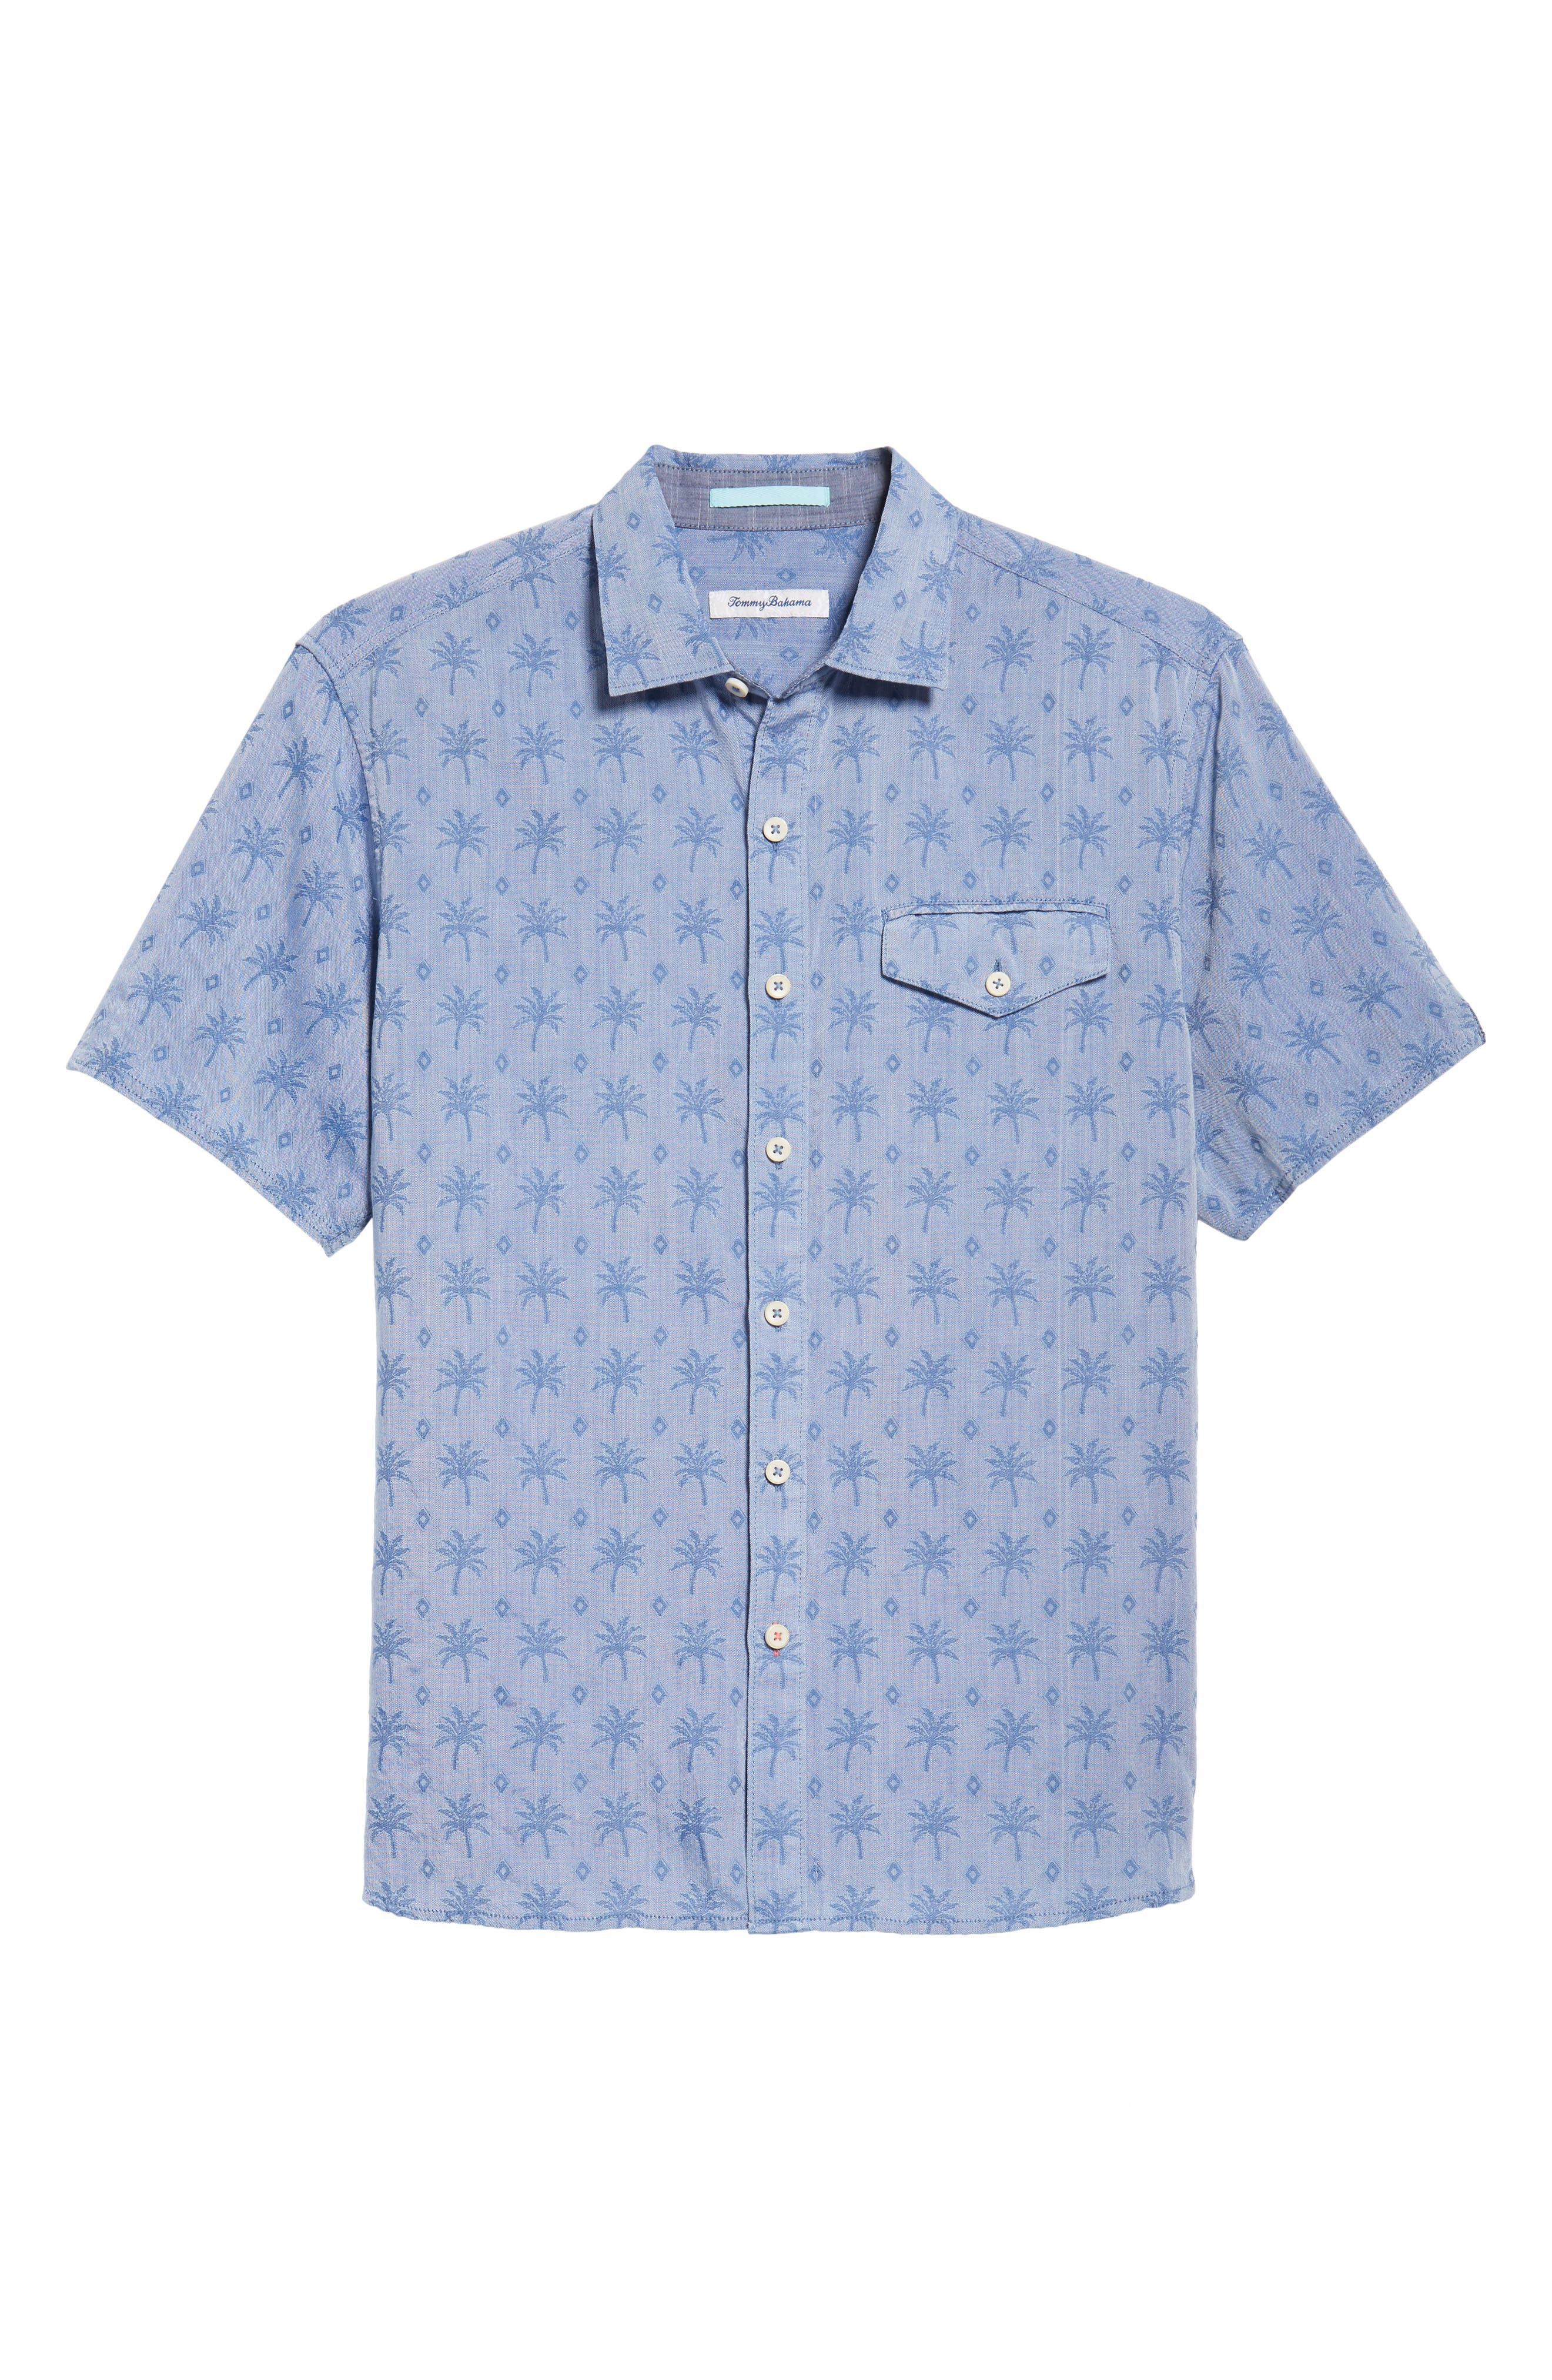 Palm Palm Regular Fit Jacquard Sport Shirt,                             Alternate thumbnail 6, color,                             400